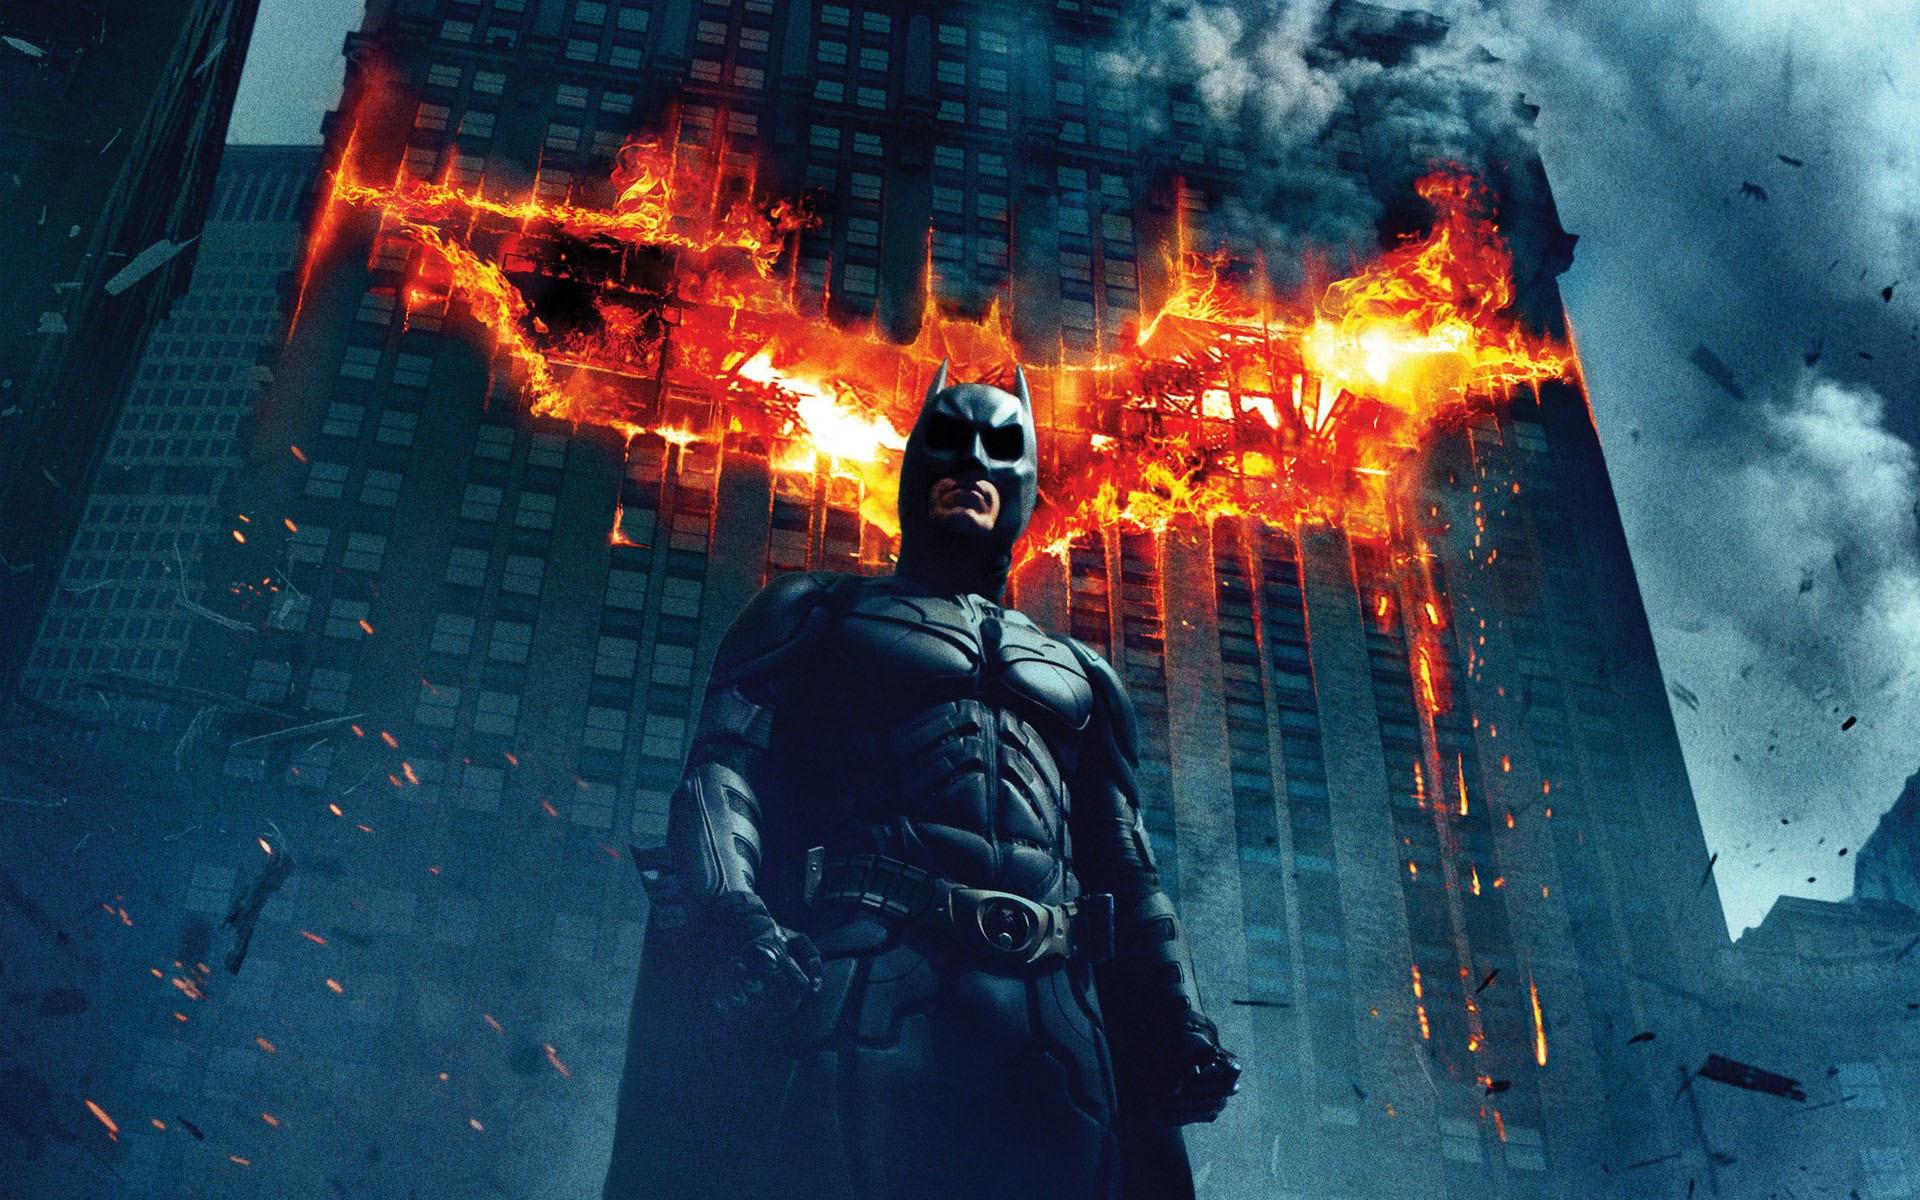 Fire Bat-Signal on a building – The Dark Knight wallpaper